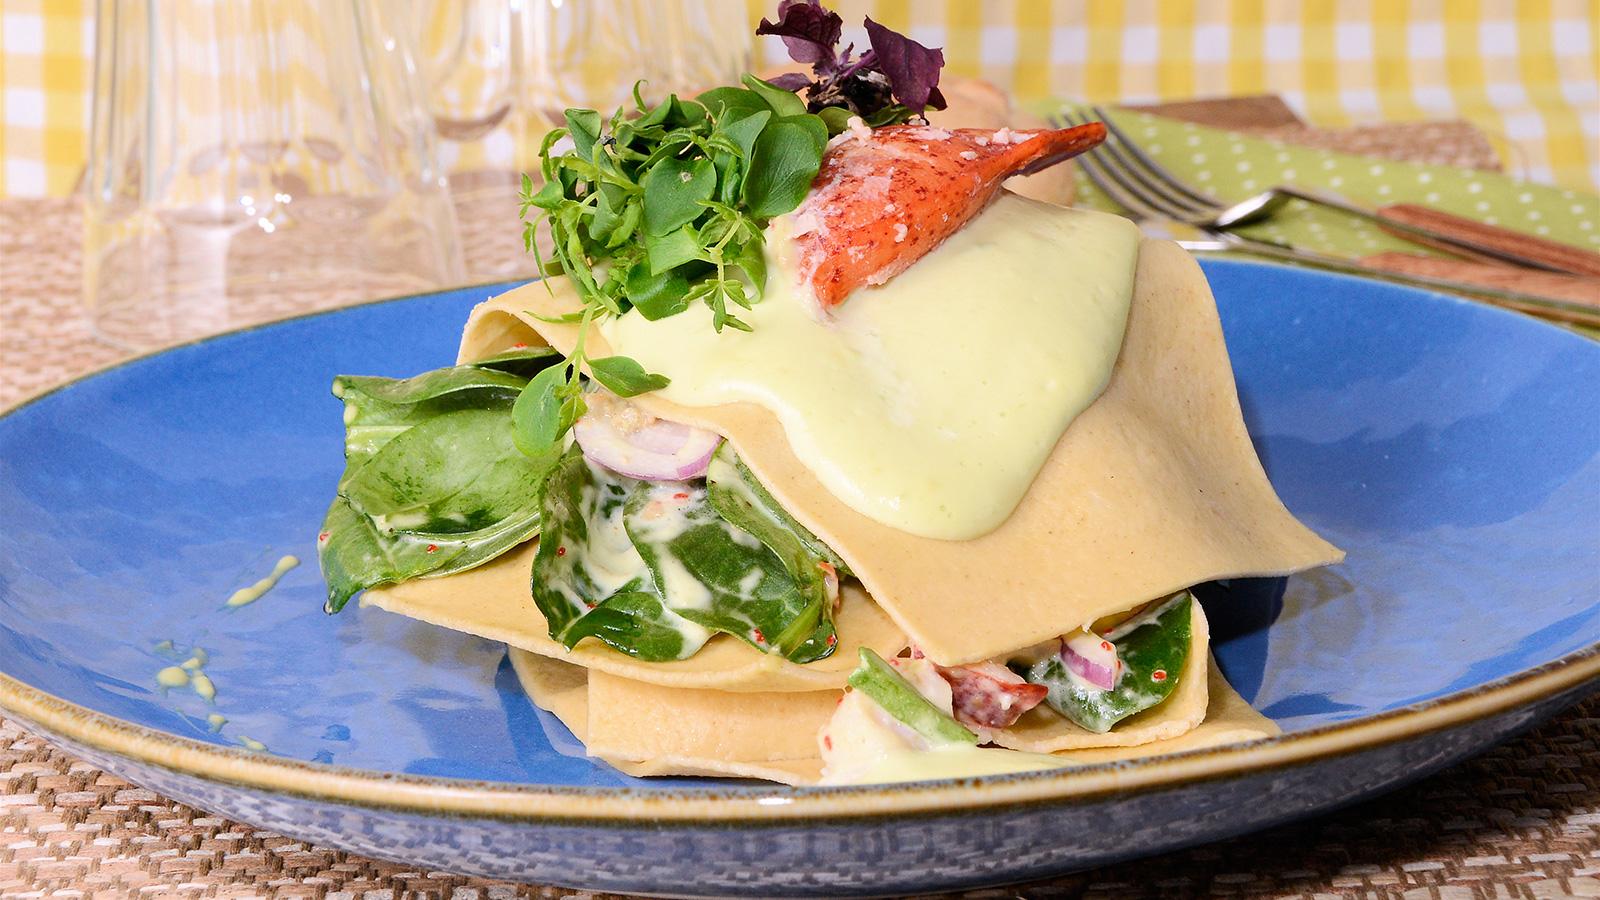 Lasa a de pasta fresca con bogavante y salsa fr a de - Salsa para bogavante cocido ...